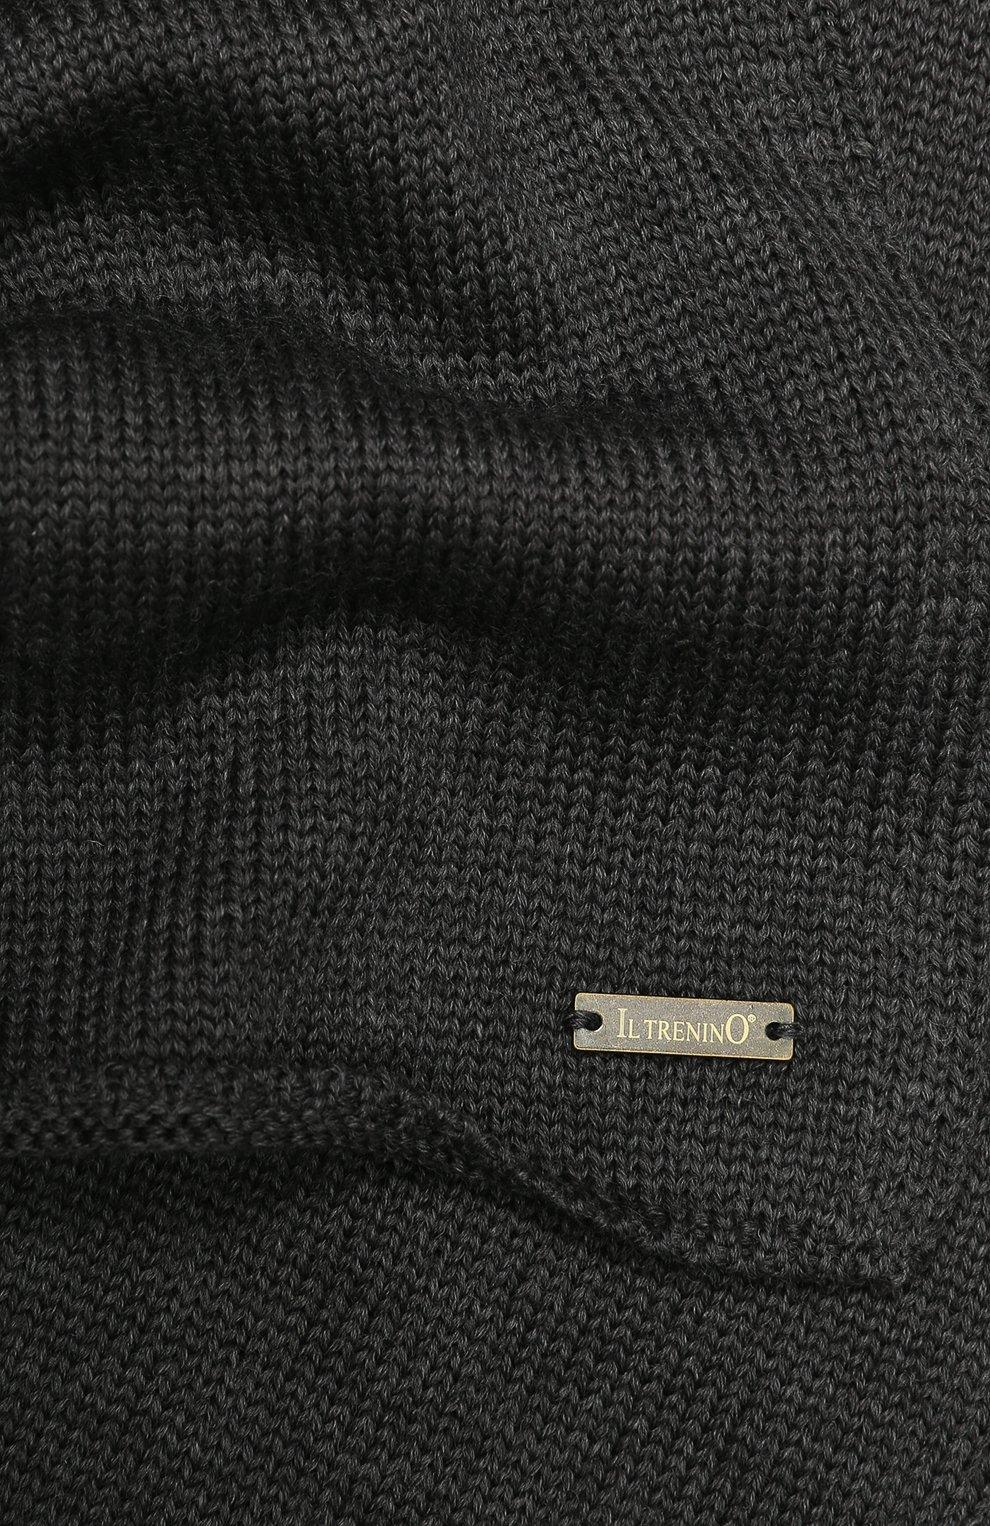 Детский шерстяной шарф IL TRENINO темно-серого цвета, арт. 19 1121/E0 | Фото 2